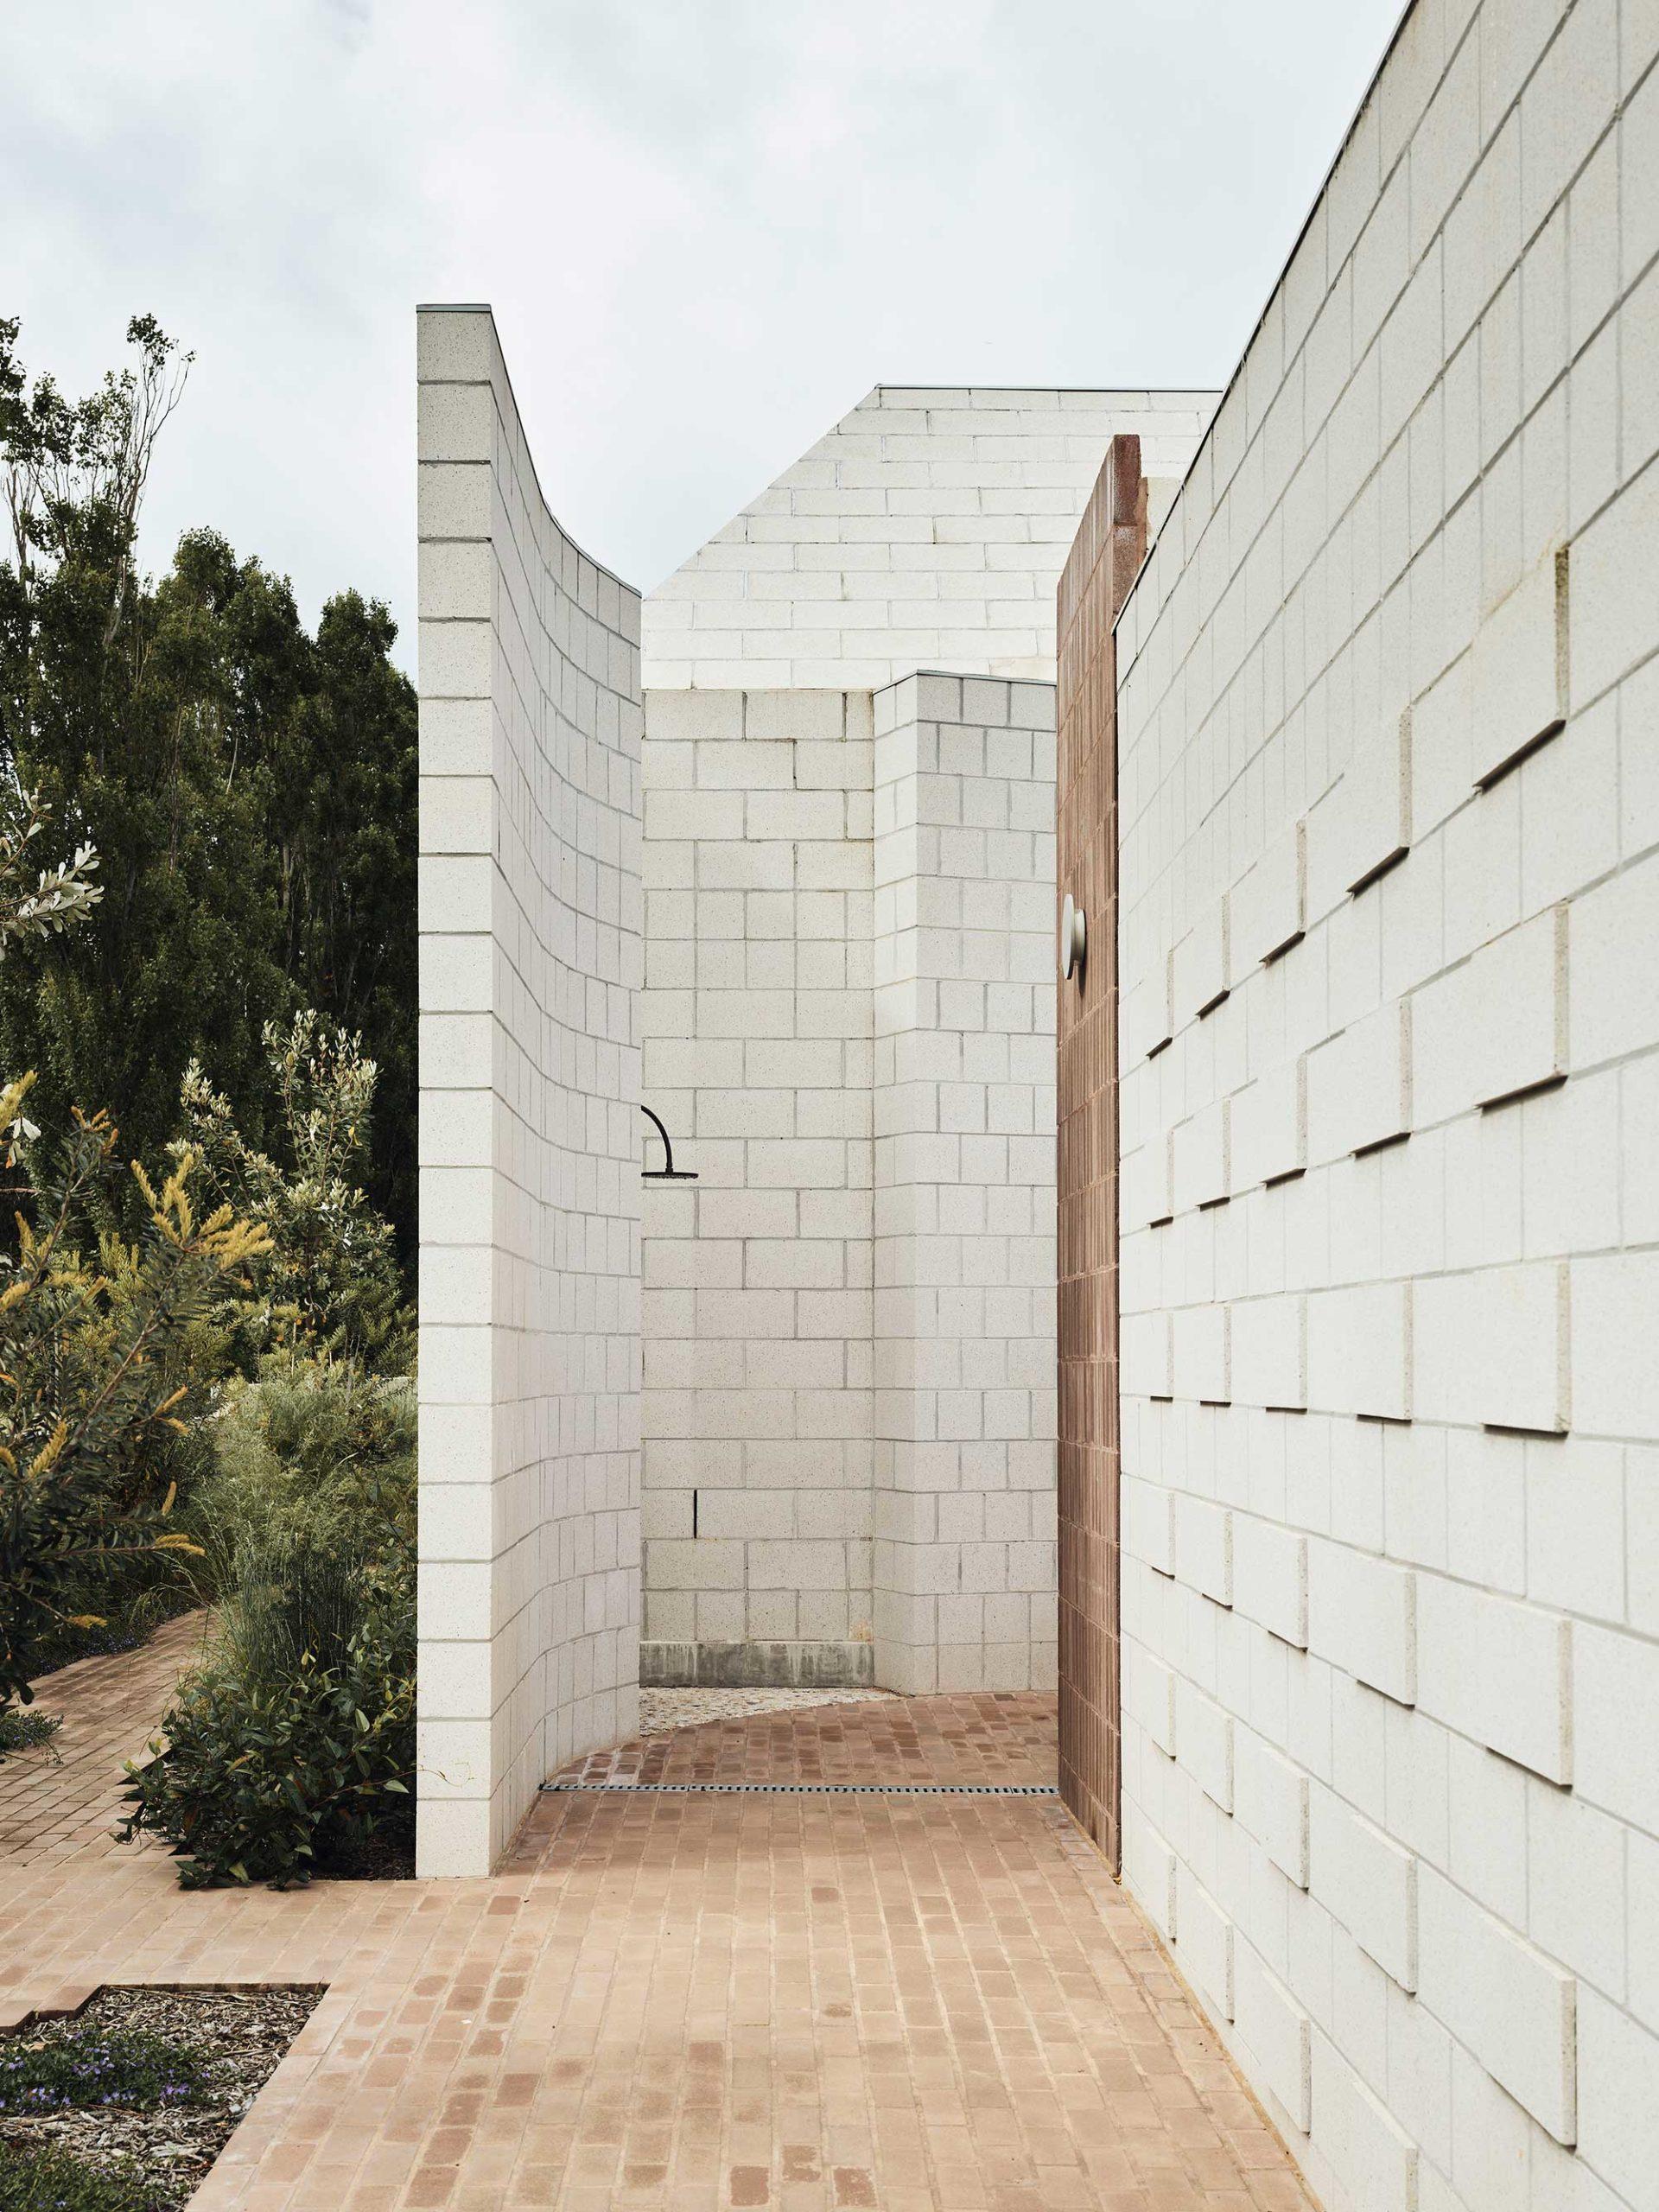 Architects Eat Bellows Beach House Flinders Masonry Architecture Photo Derek Swalwell Yellowtrace 55